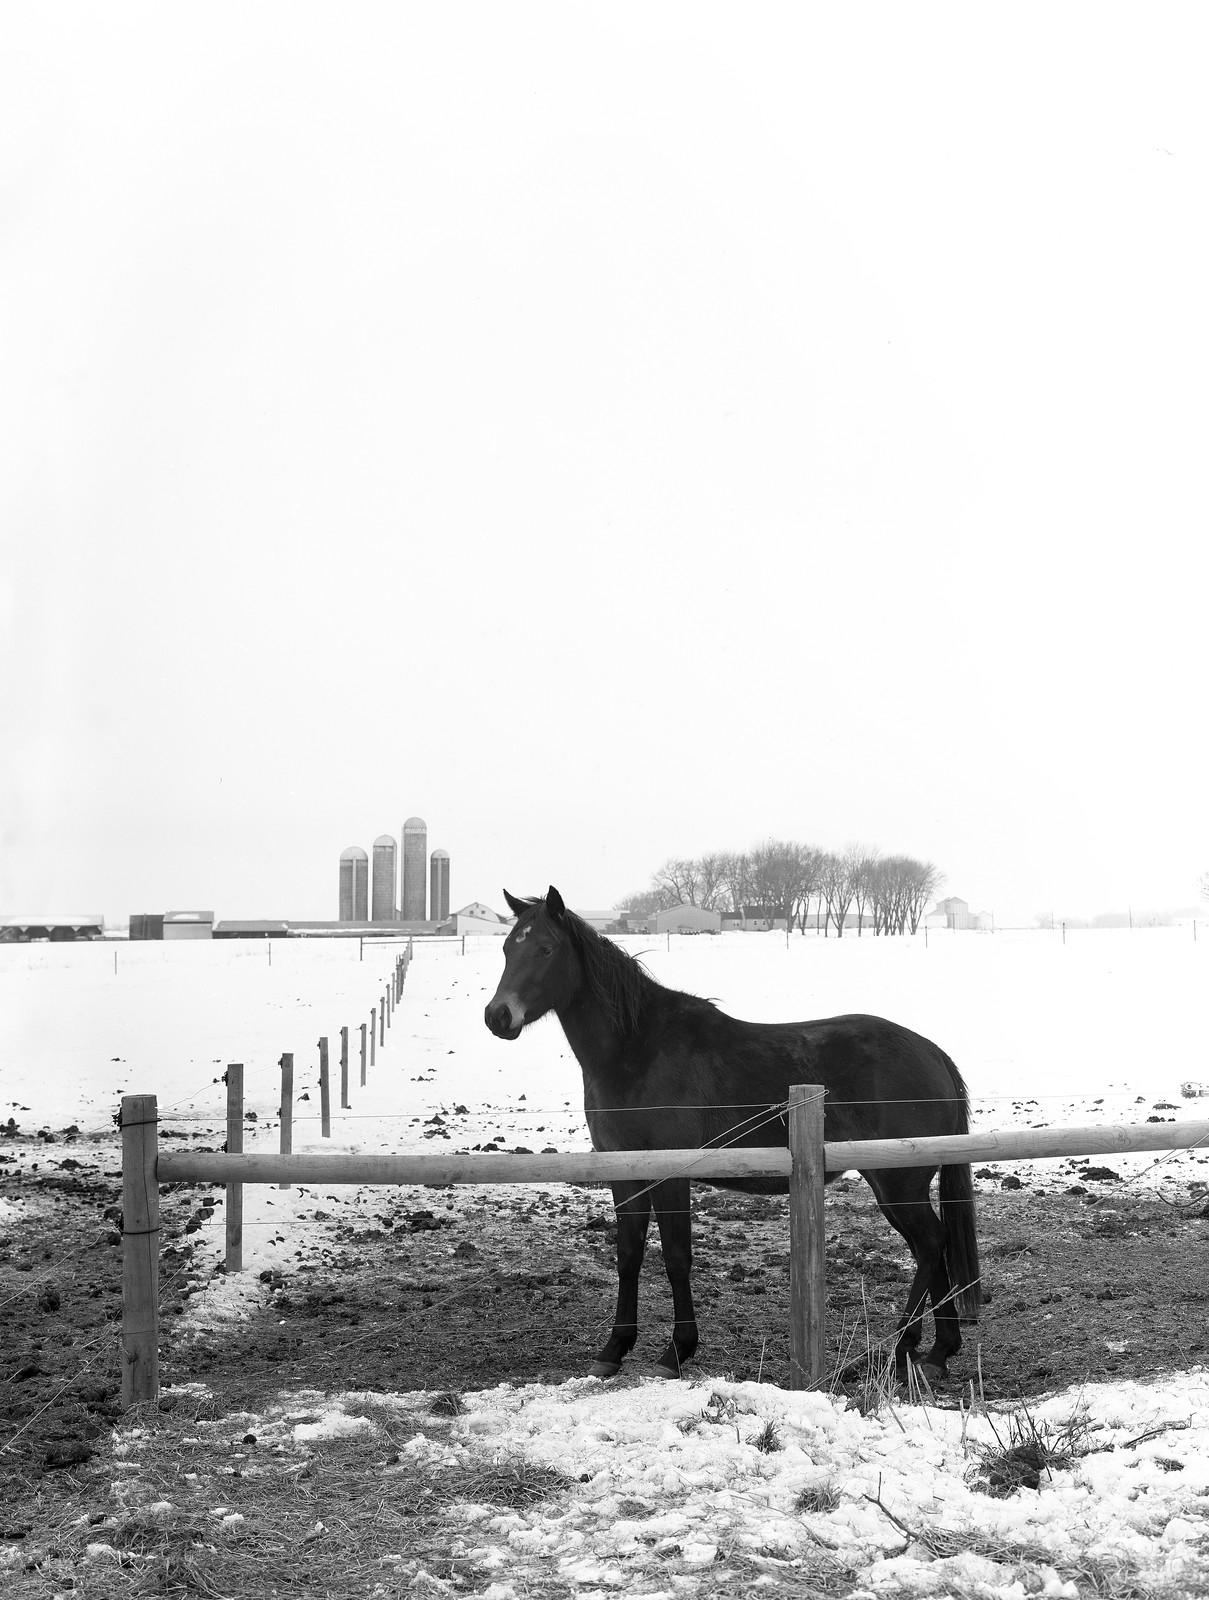 Vixen Hollow, Toyo 45A, Kodak Tmax 100